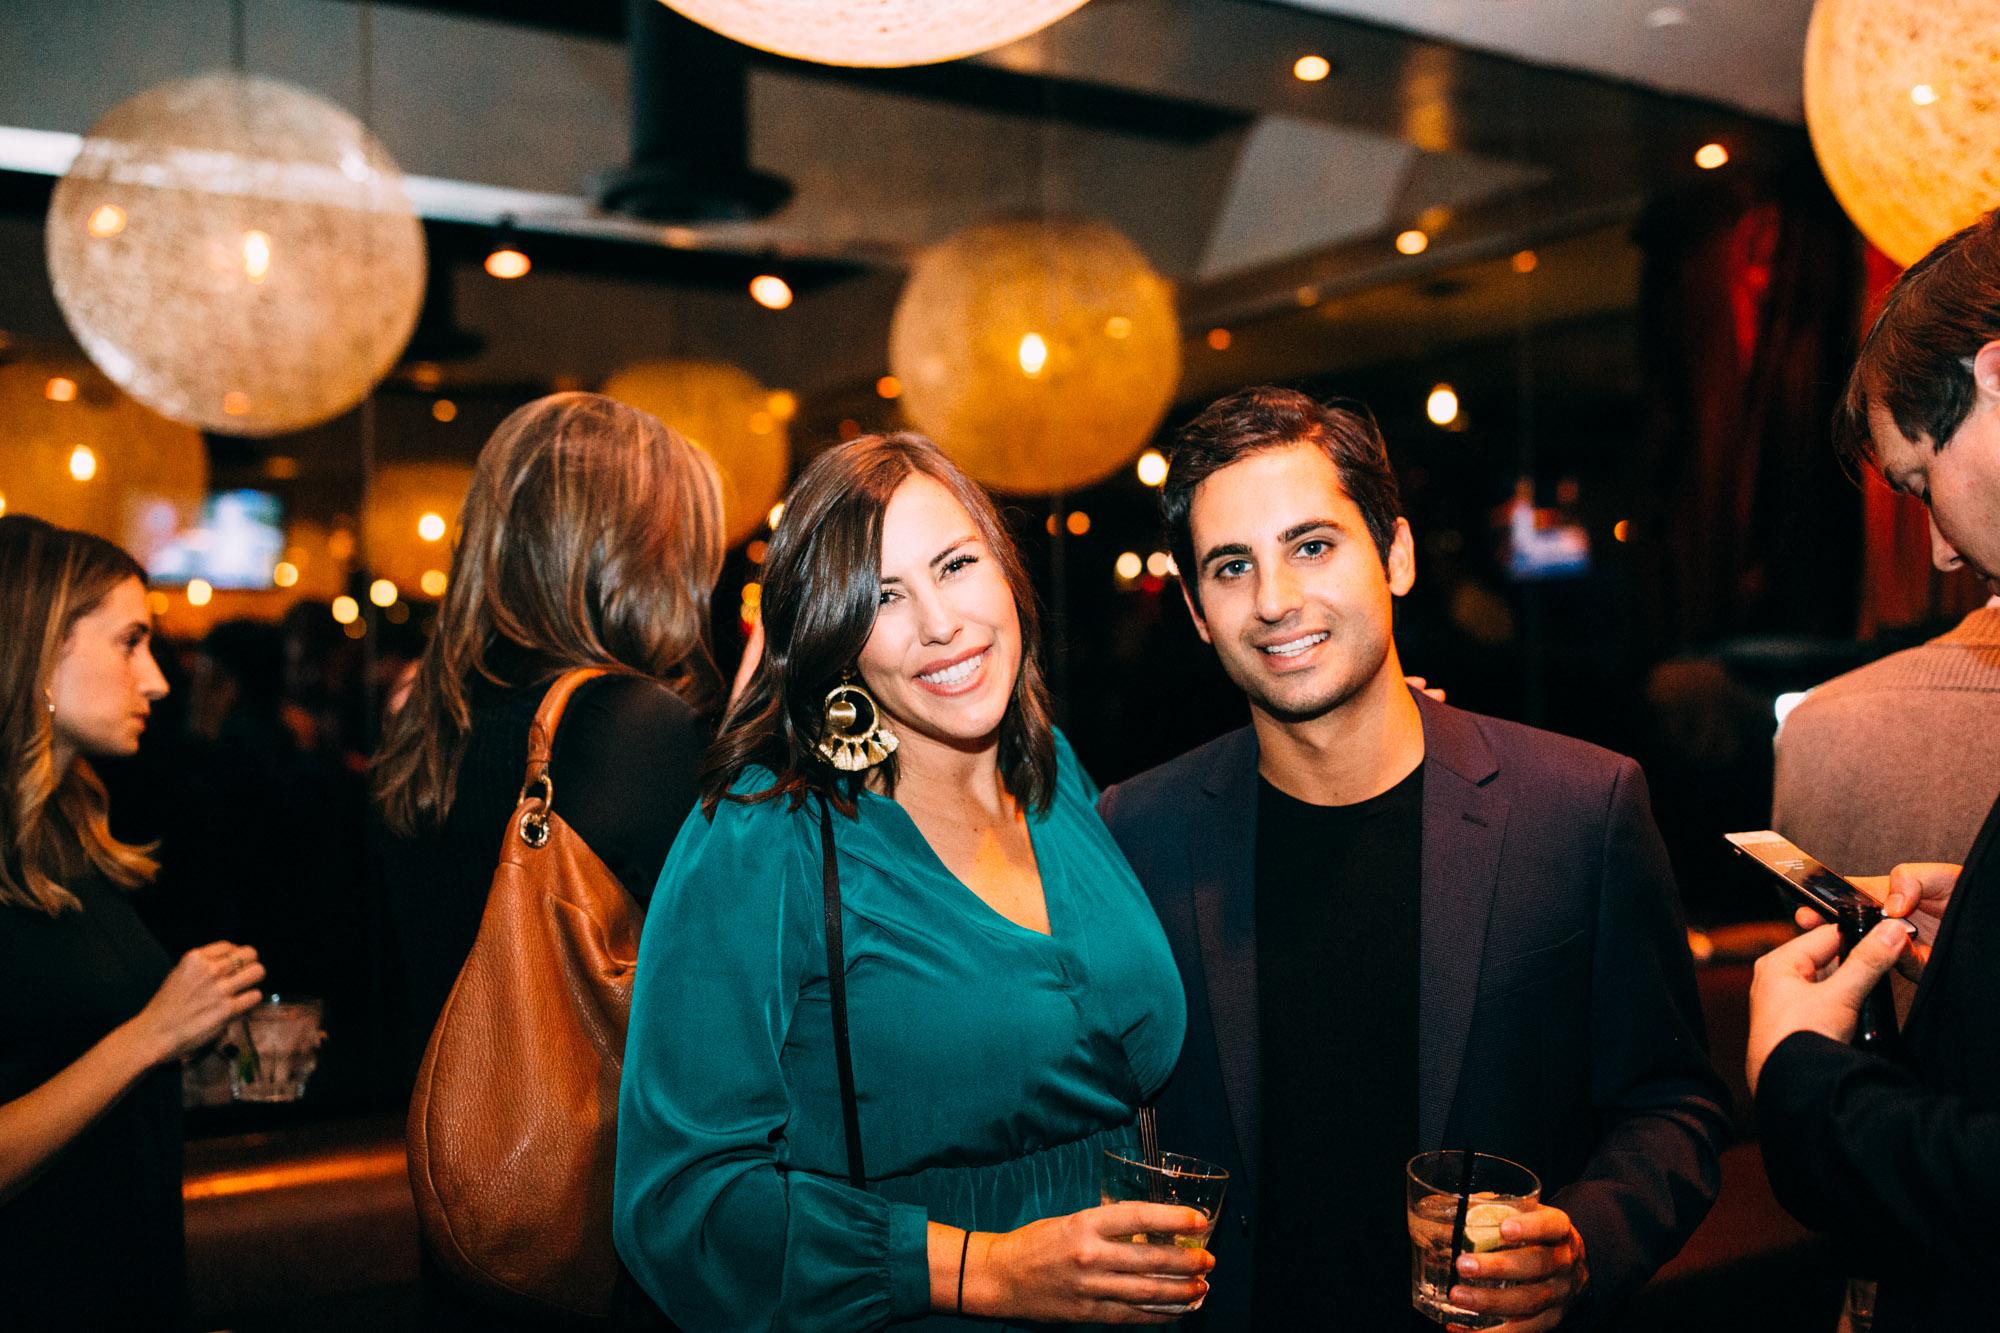 DREAM Charter School - Diamond Ball 2017 Lucky Strike Corporate Event Photographer Rachel Hanon Photography-37.jpg